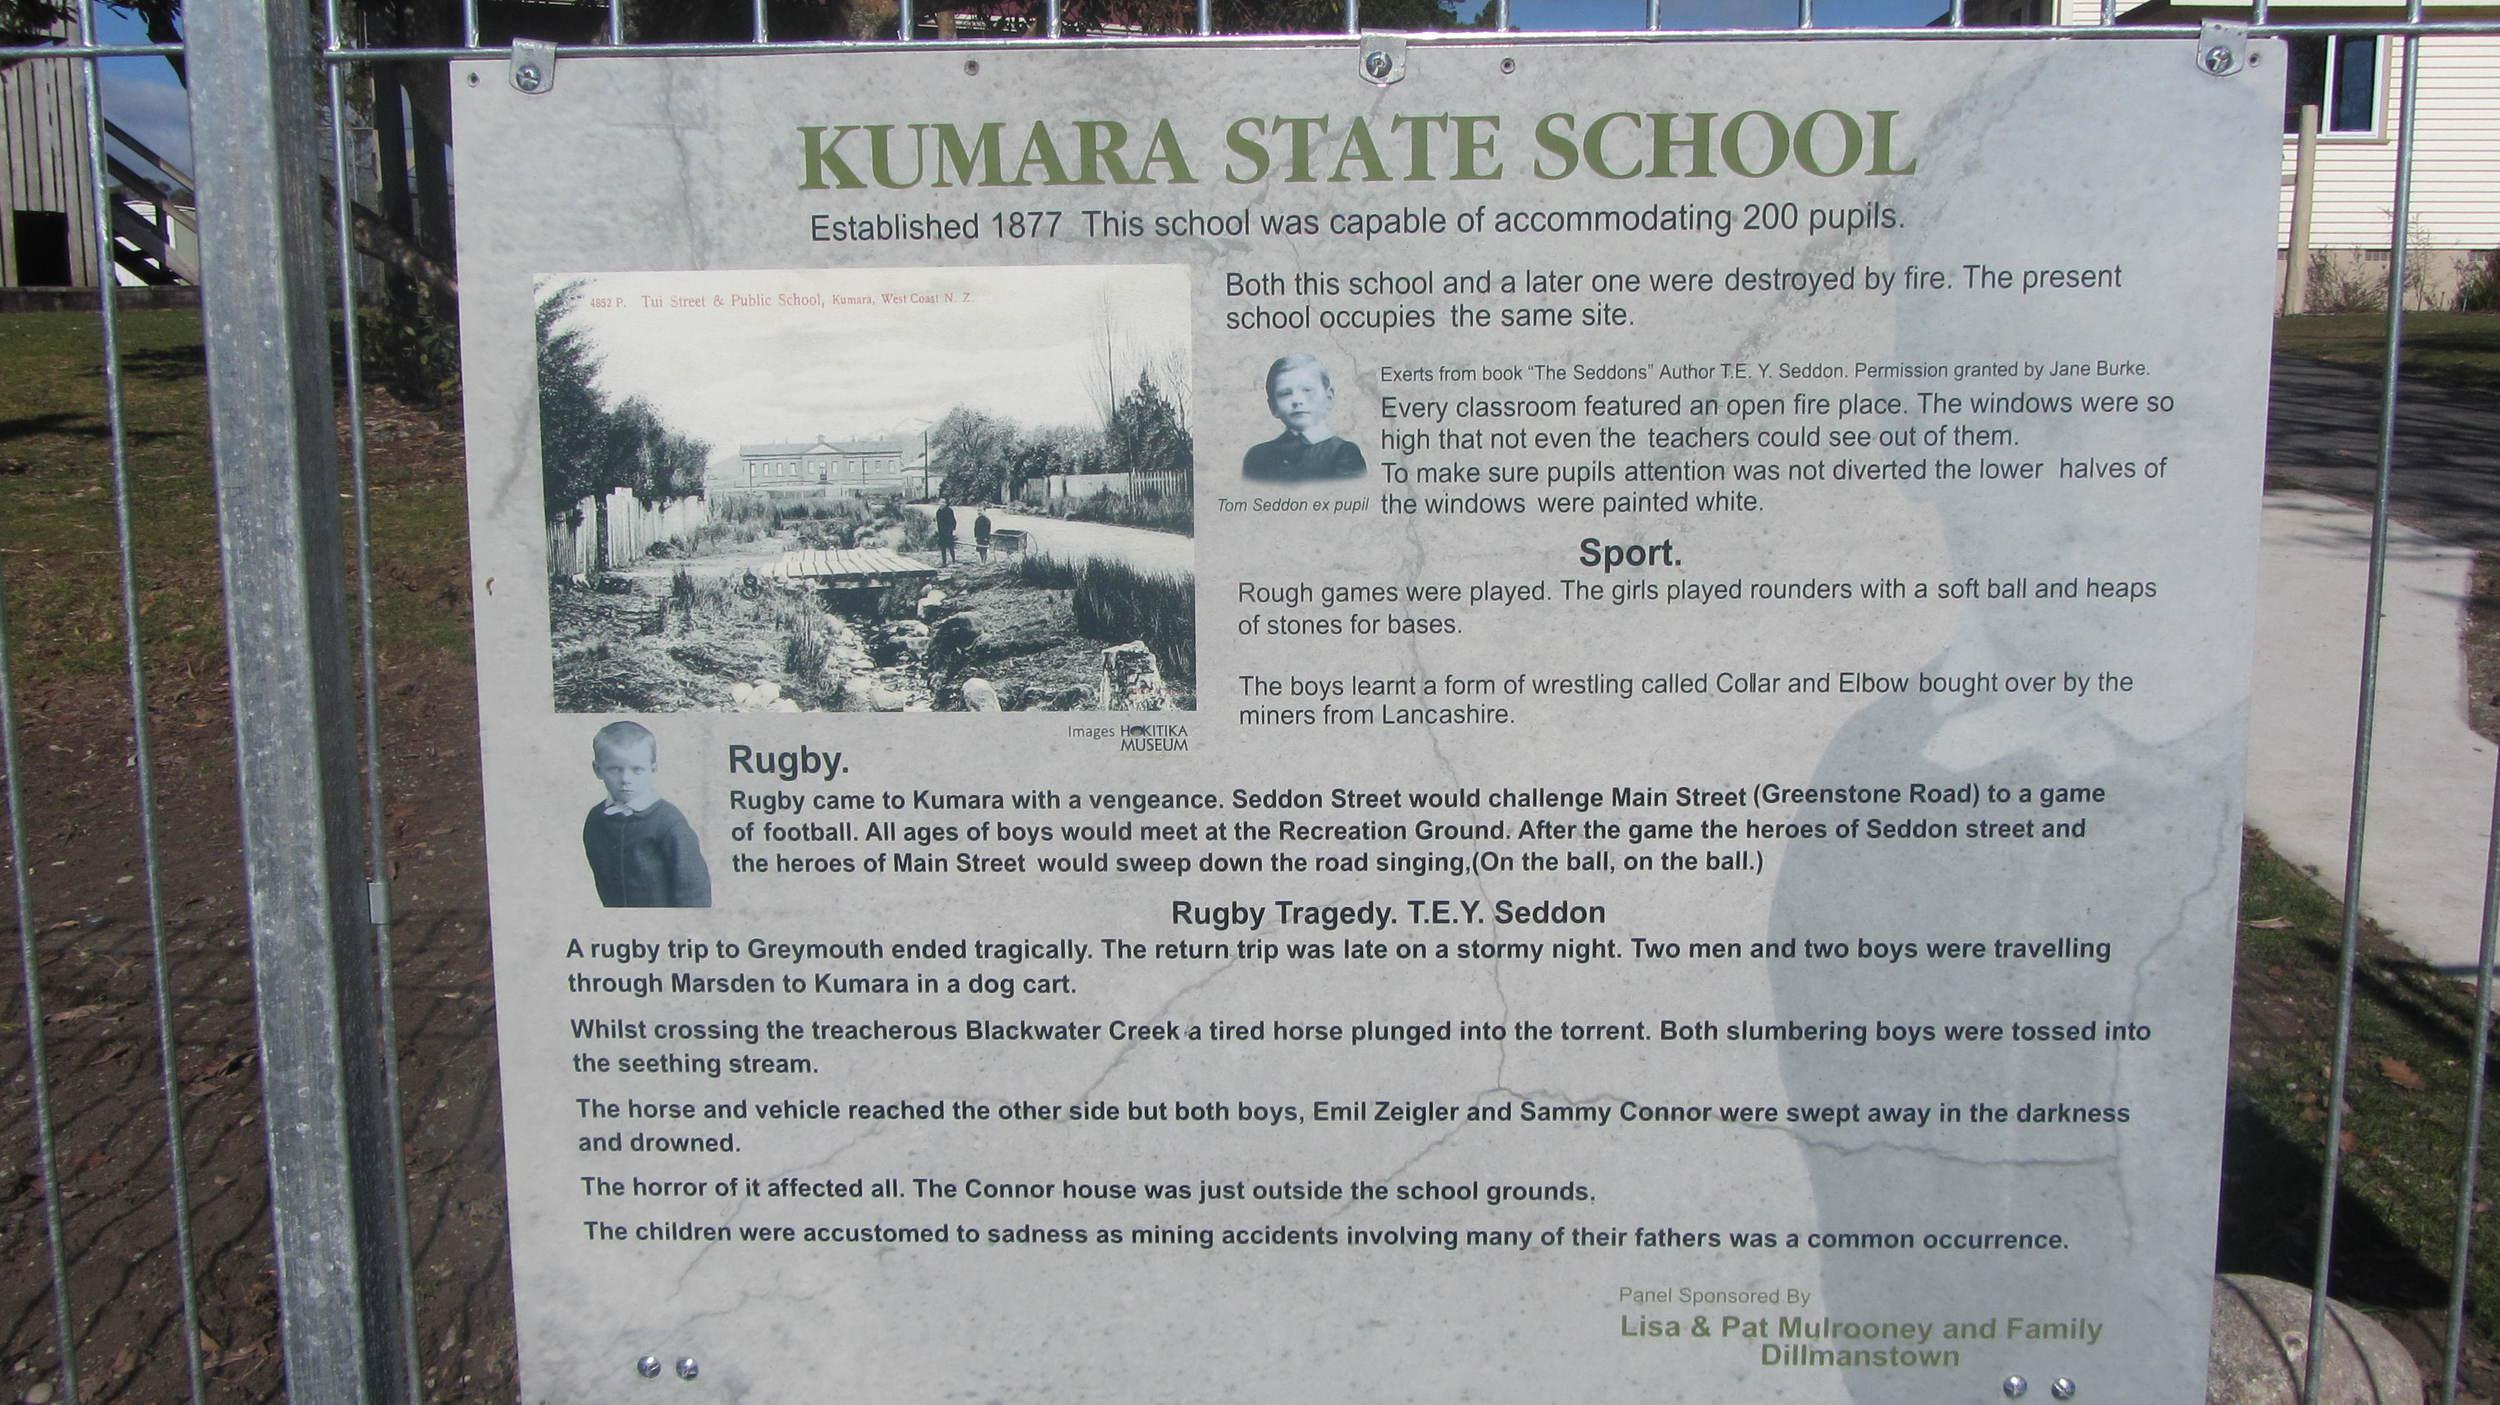 Kumara School history panel